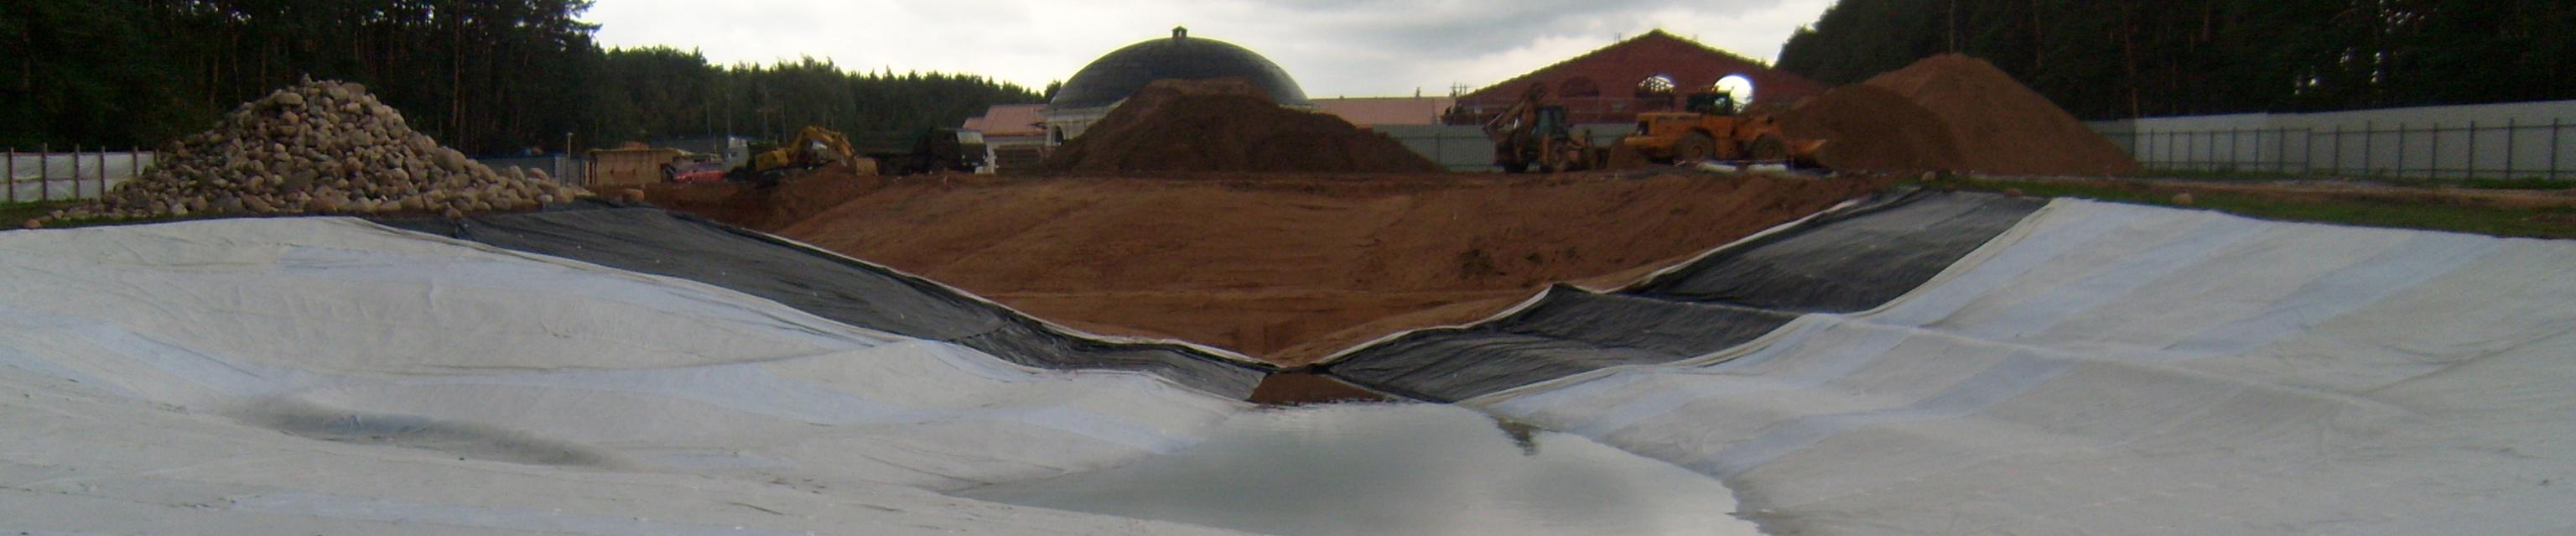 монтаж гидроизоляции водоема, укладка геотекстиля